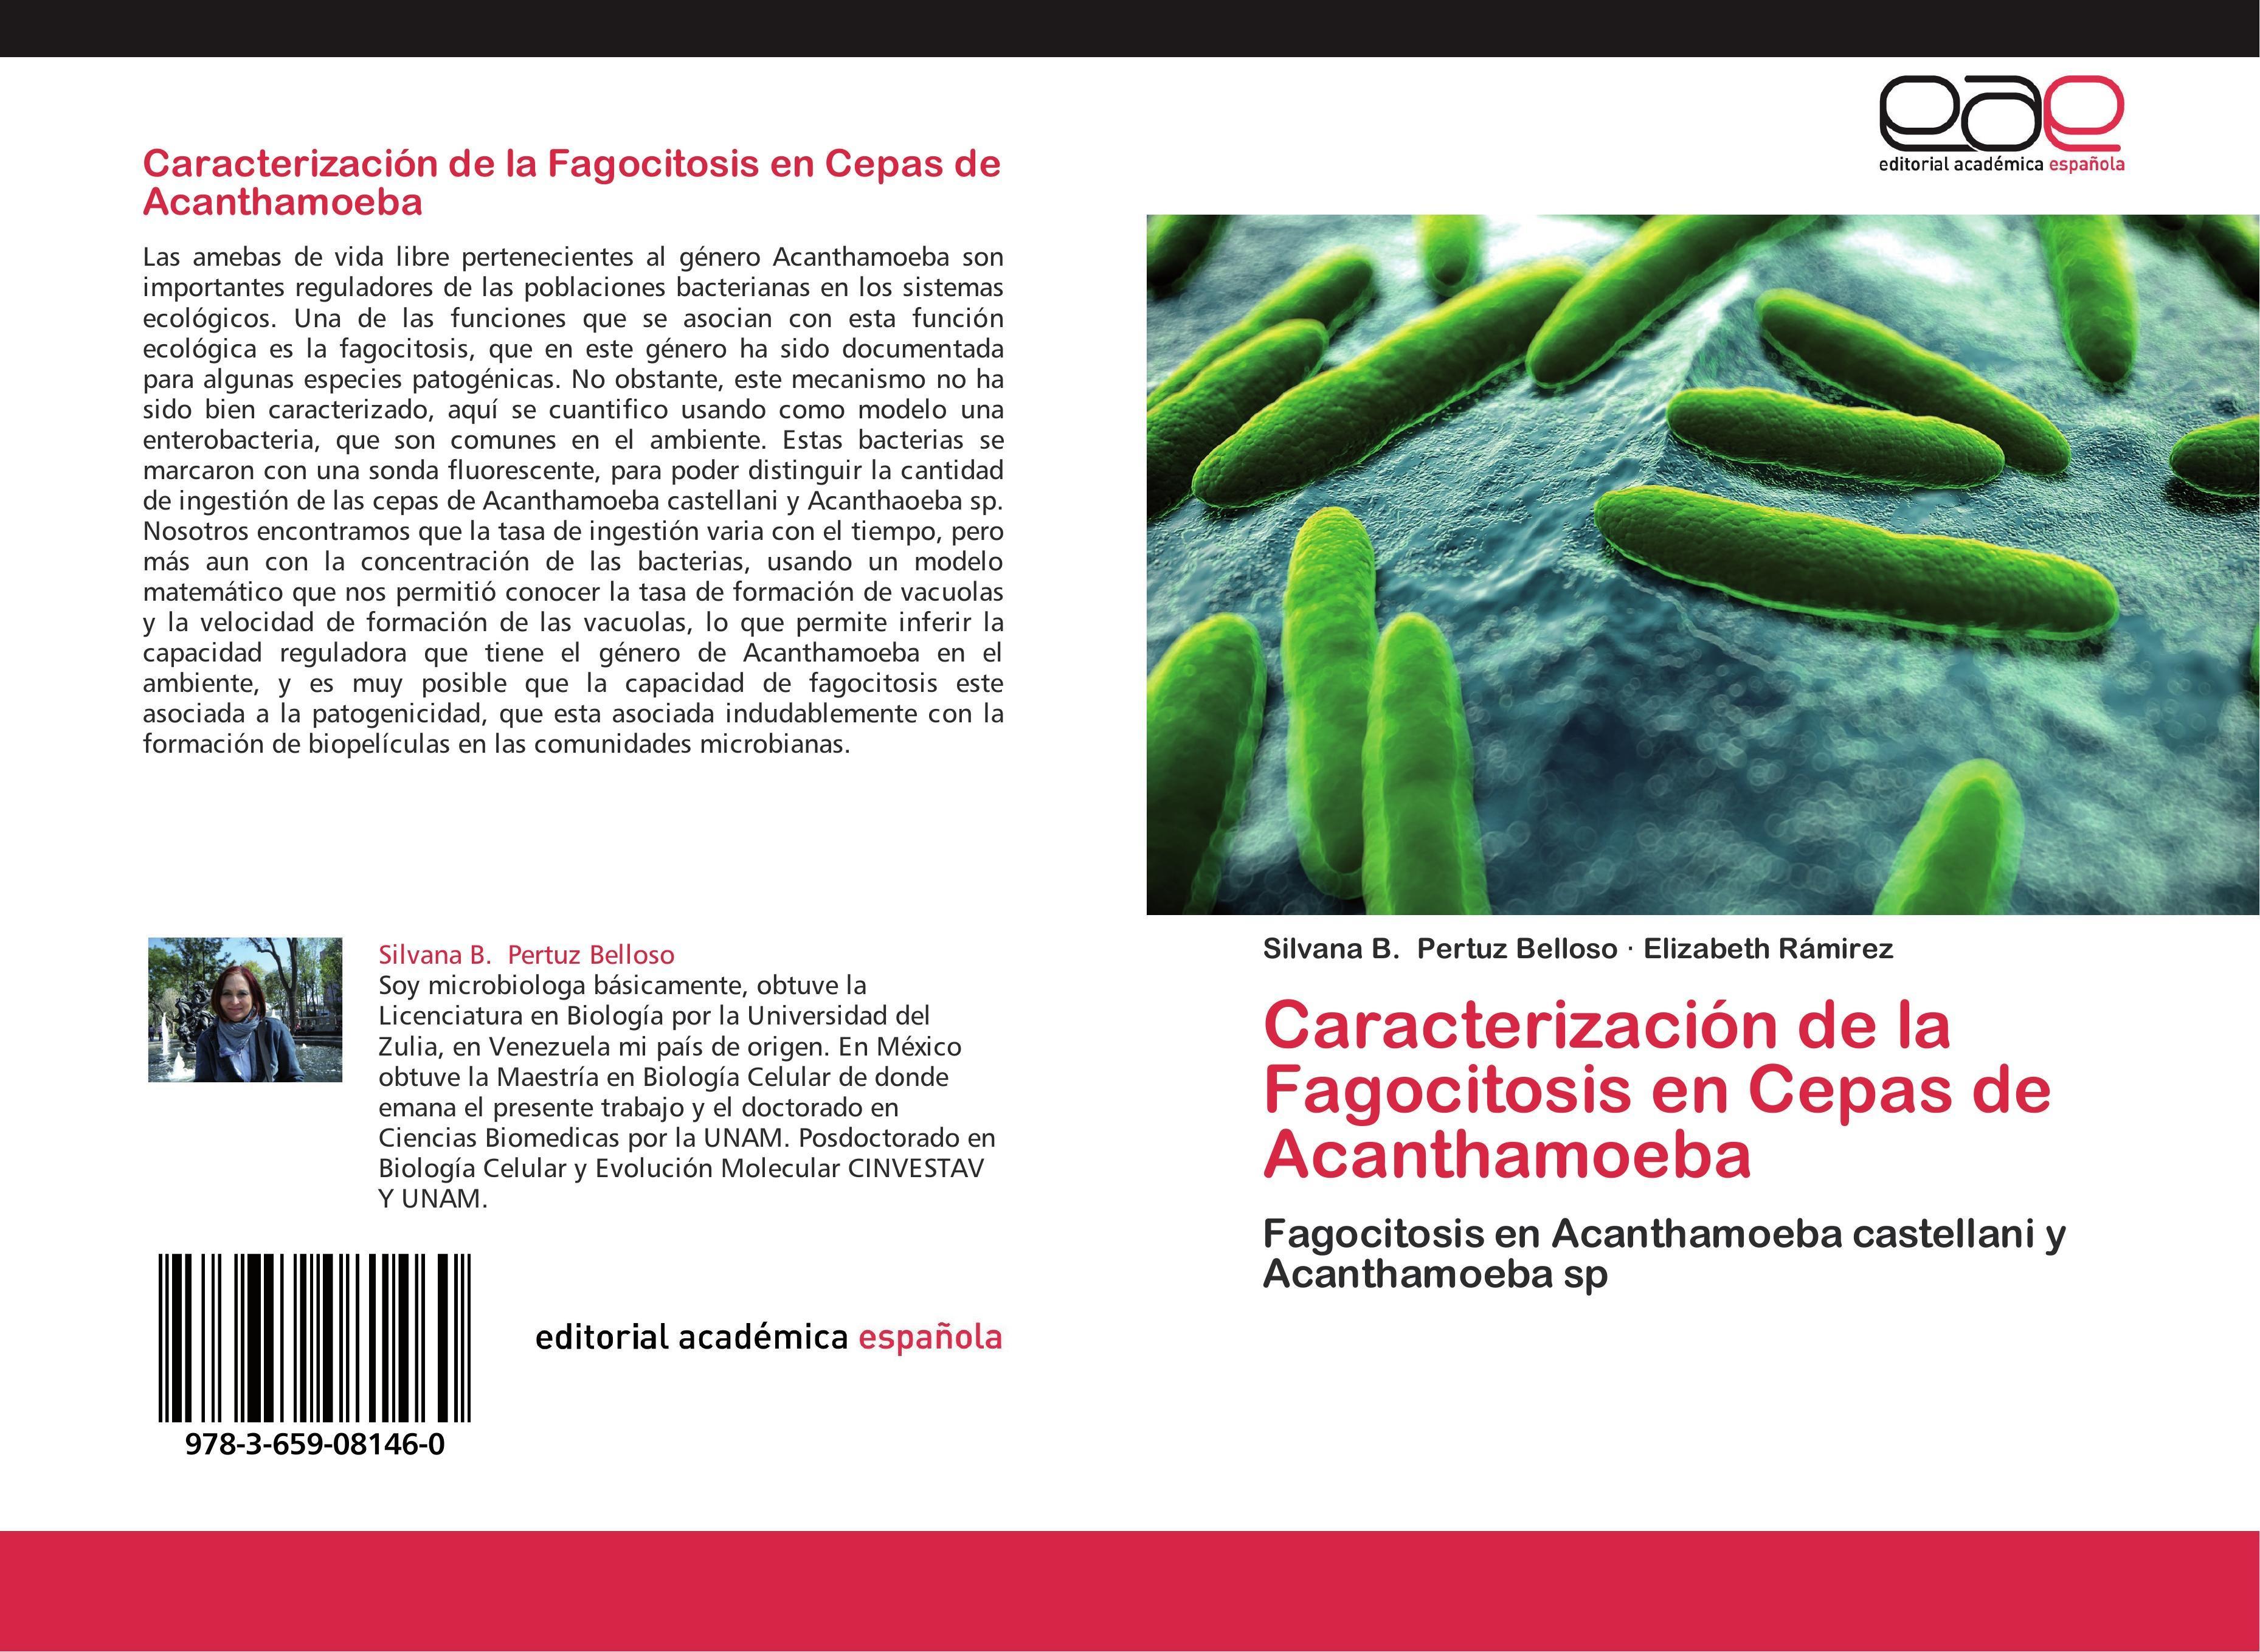 Caracterizacion-de-la-Fagocitosis-en-Cepas-de-Acanthamoeba-9783659081460